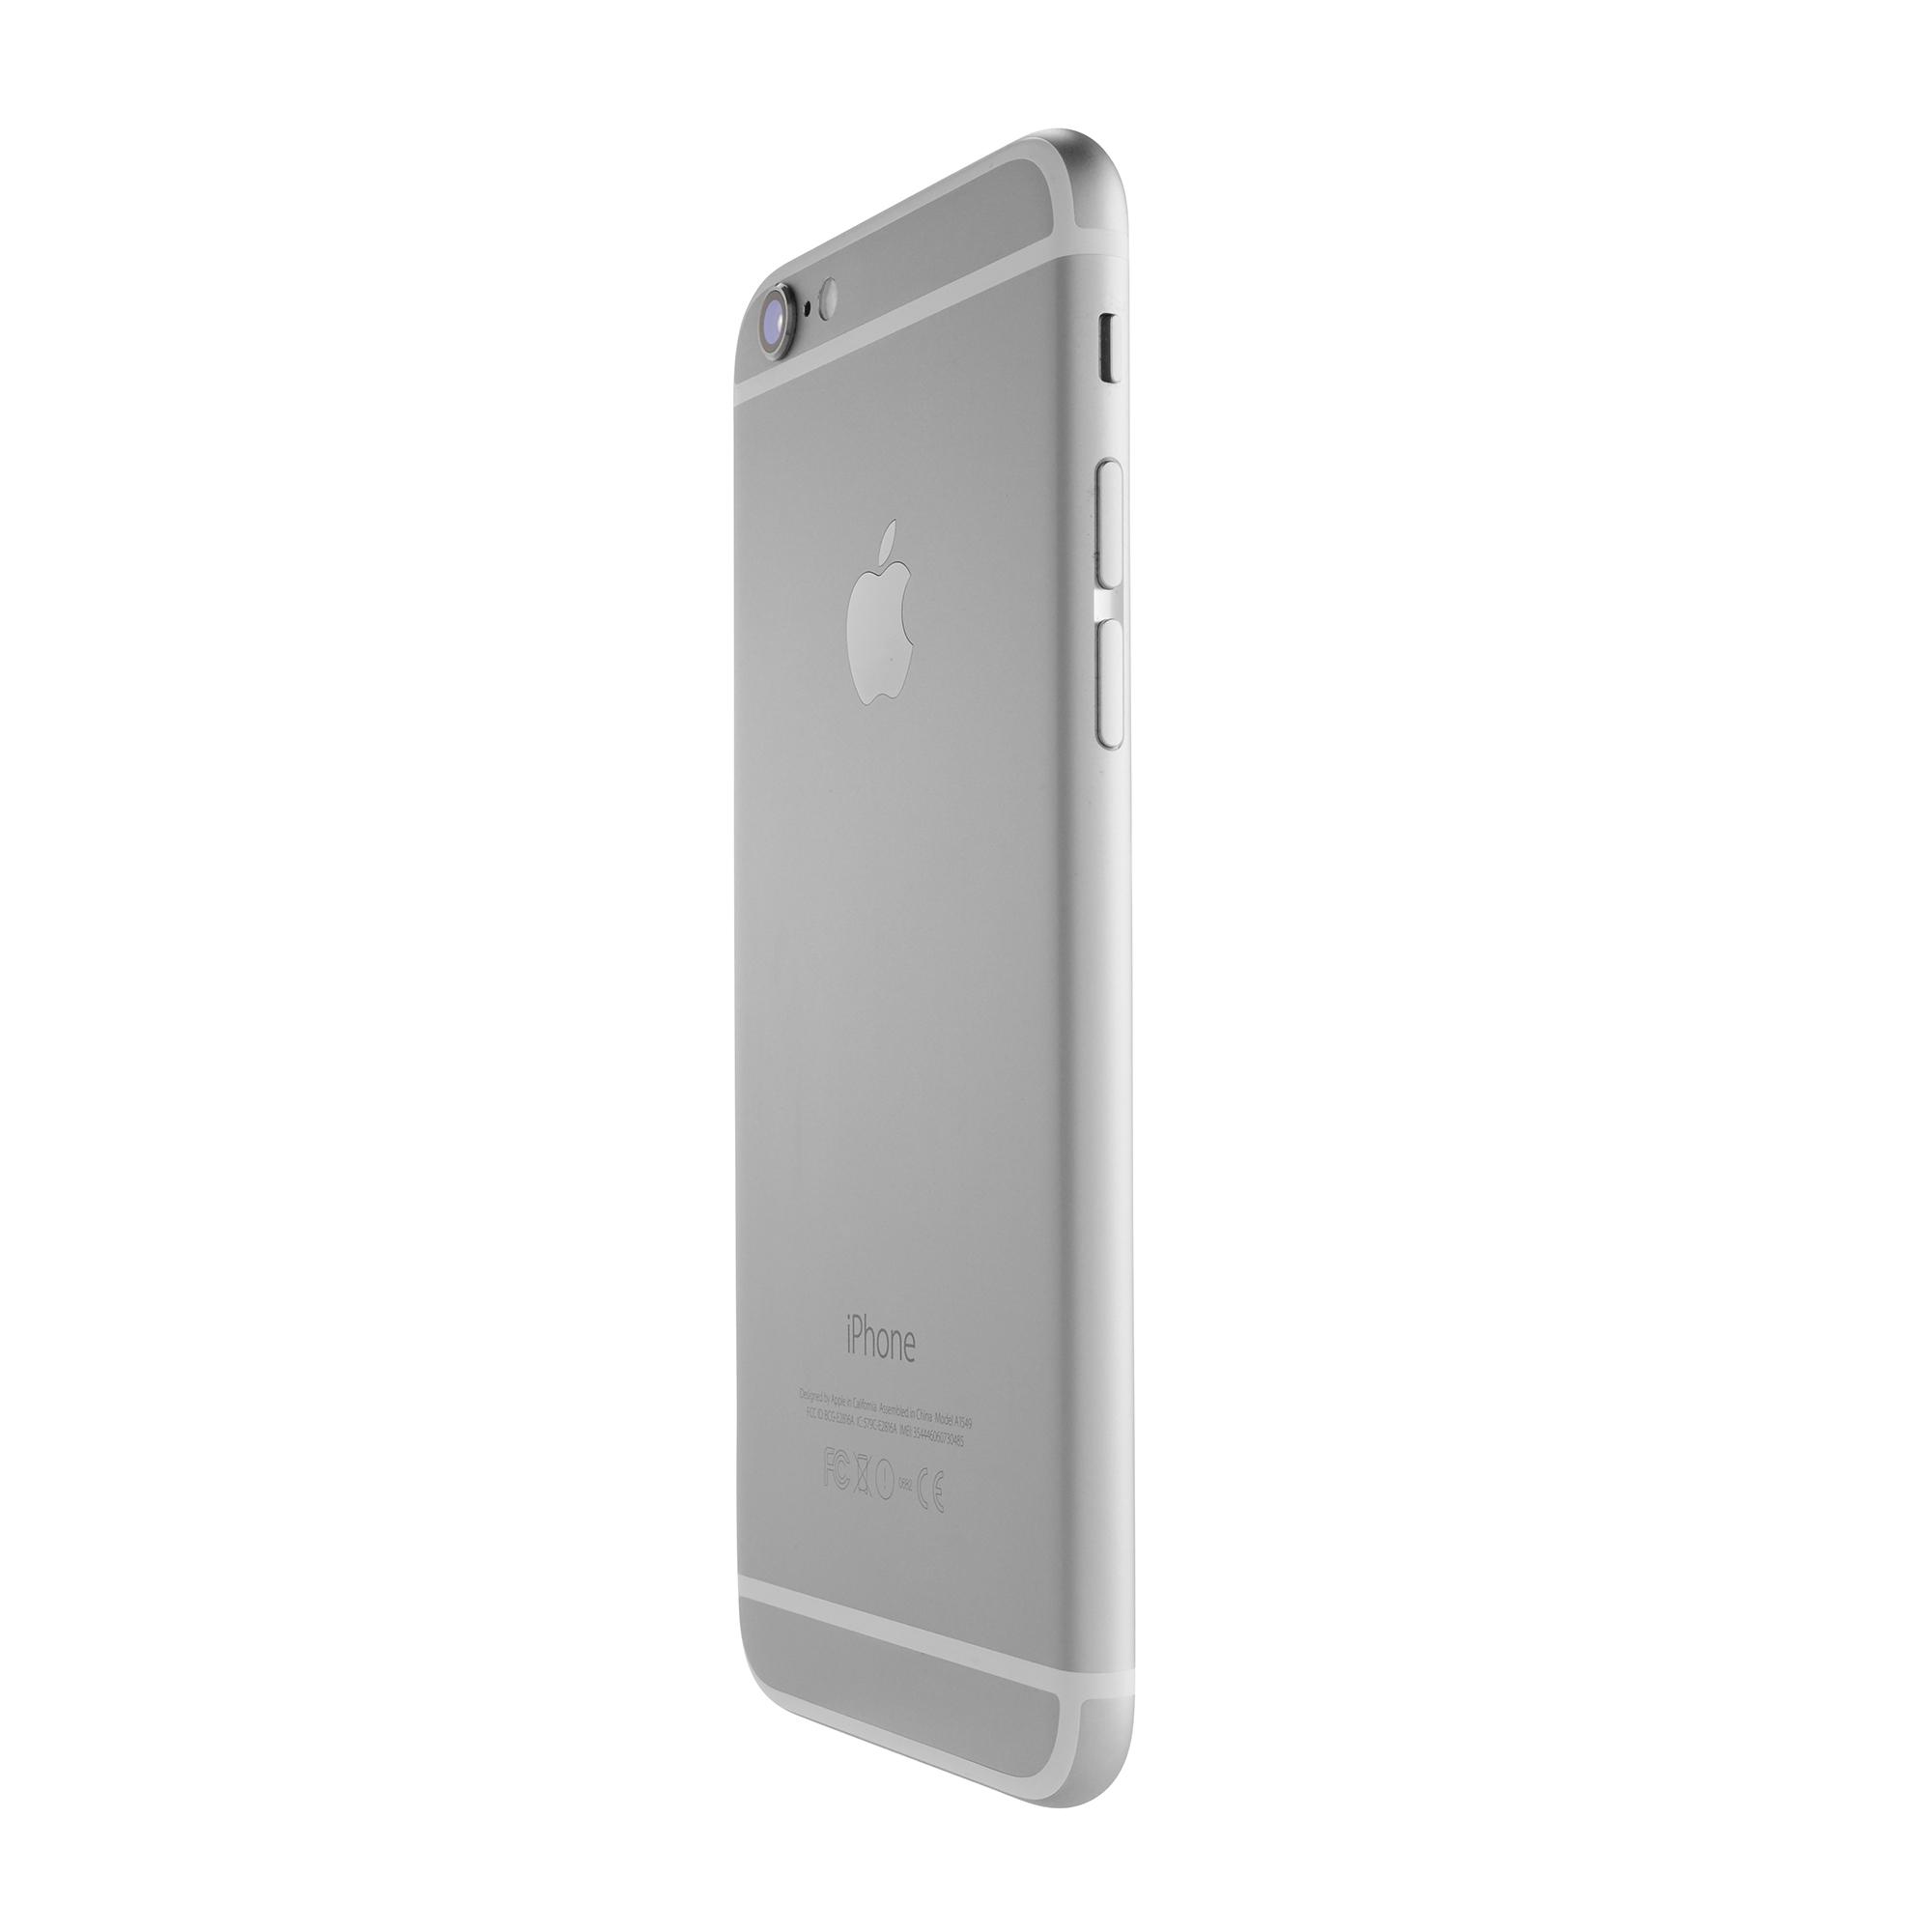 Apple iPhone 6 a1549 64GB Smartphone LTE CDMA/GSM Unlocked